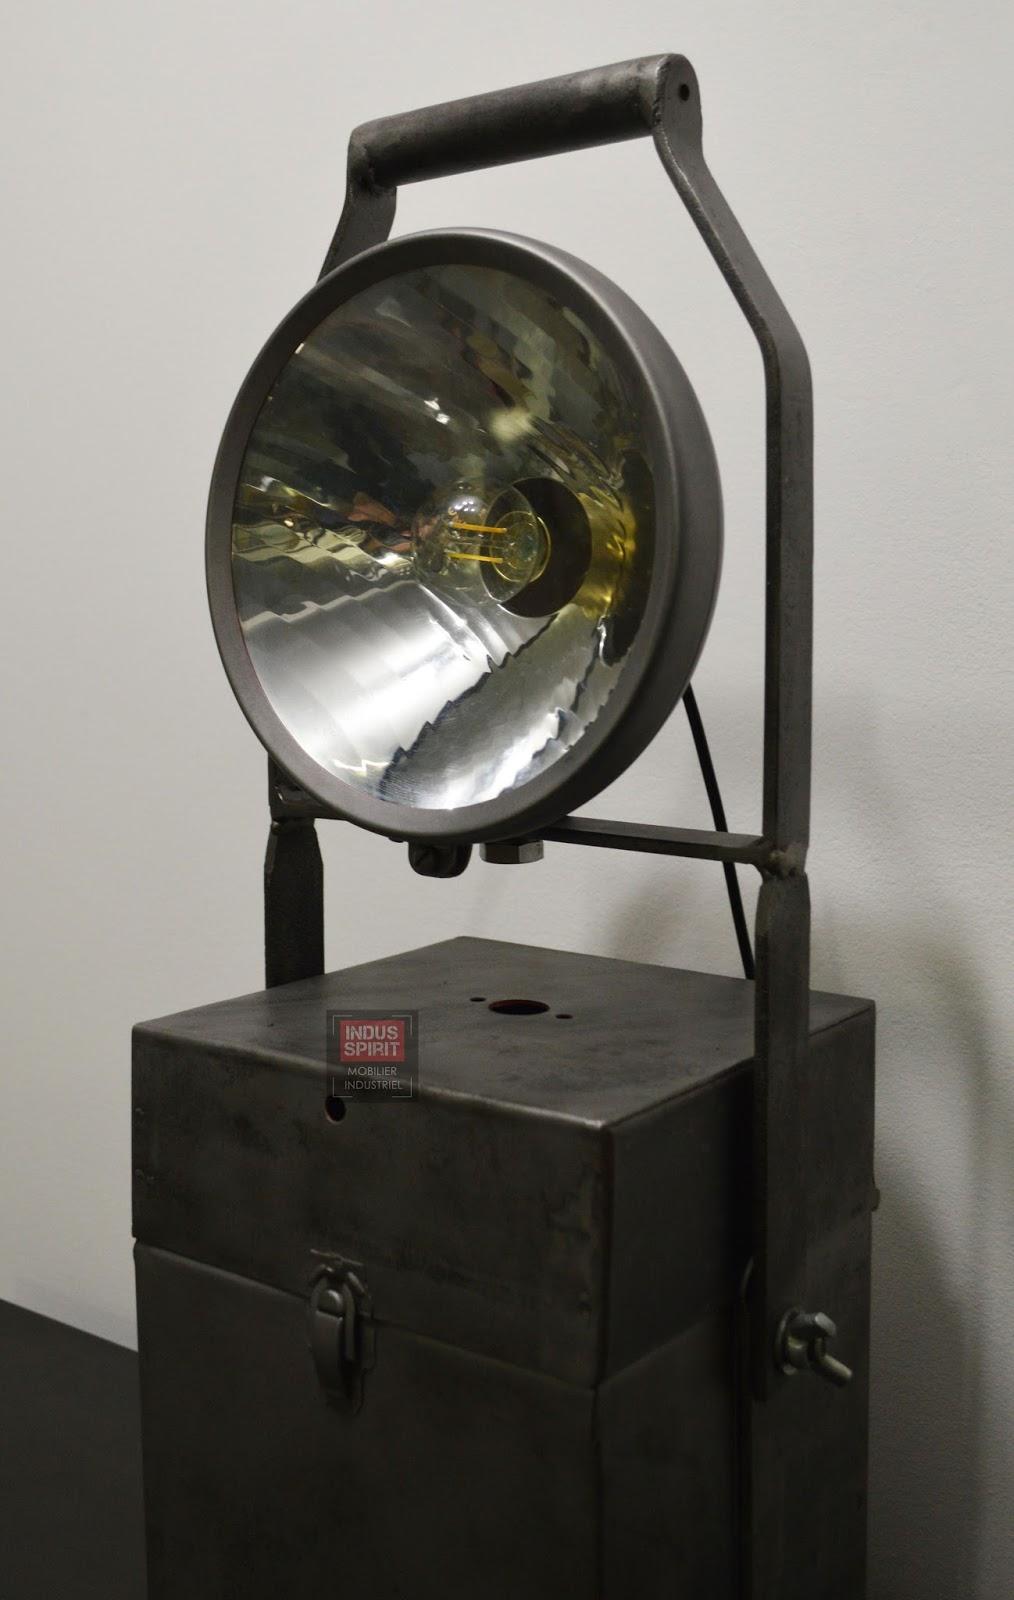 ancienne lampe portative industrielle. Black Bedroom Furniture Sets. Home Design Ideas